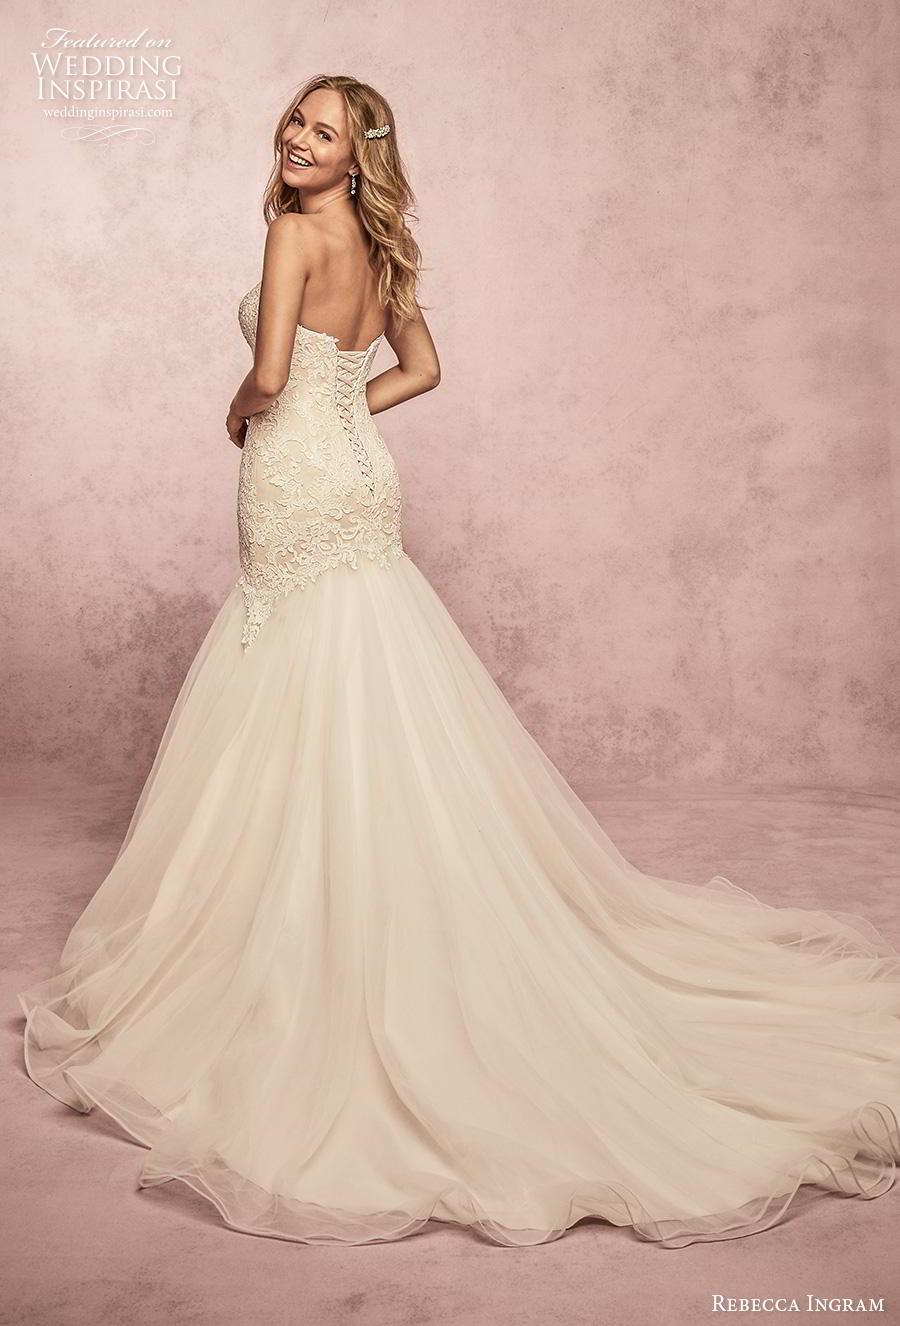 rebecca ingram s2019 bridal cap sleeves v neck heavily embellished bodice romanti mermaid wedding dress mid back chapel train (15) bv